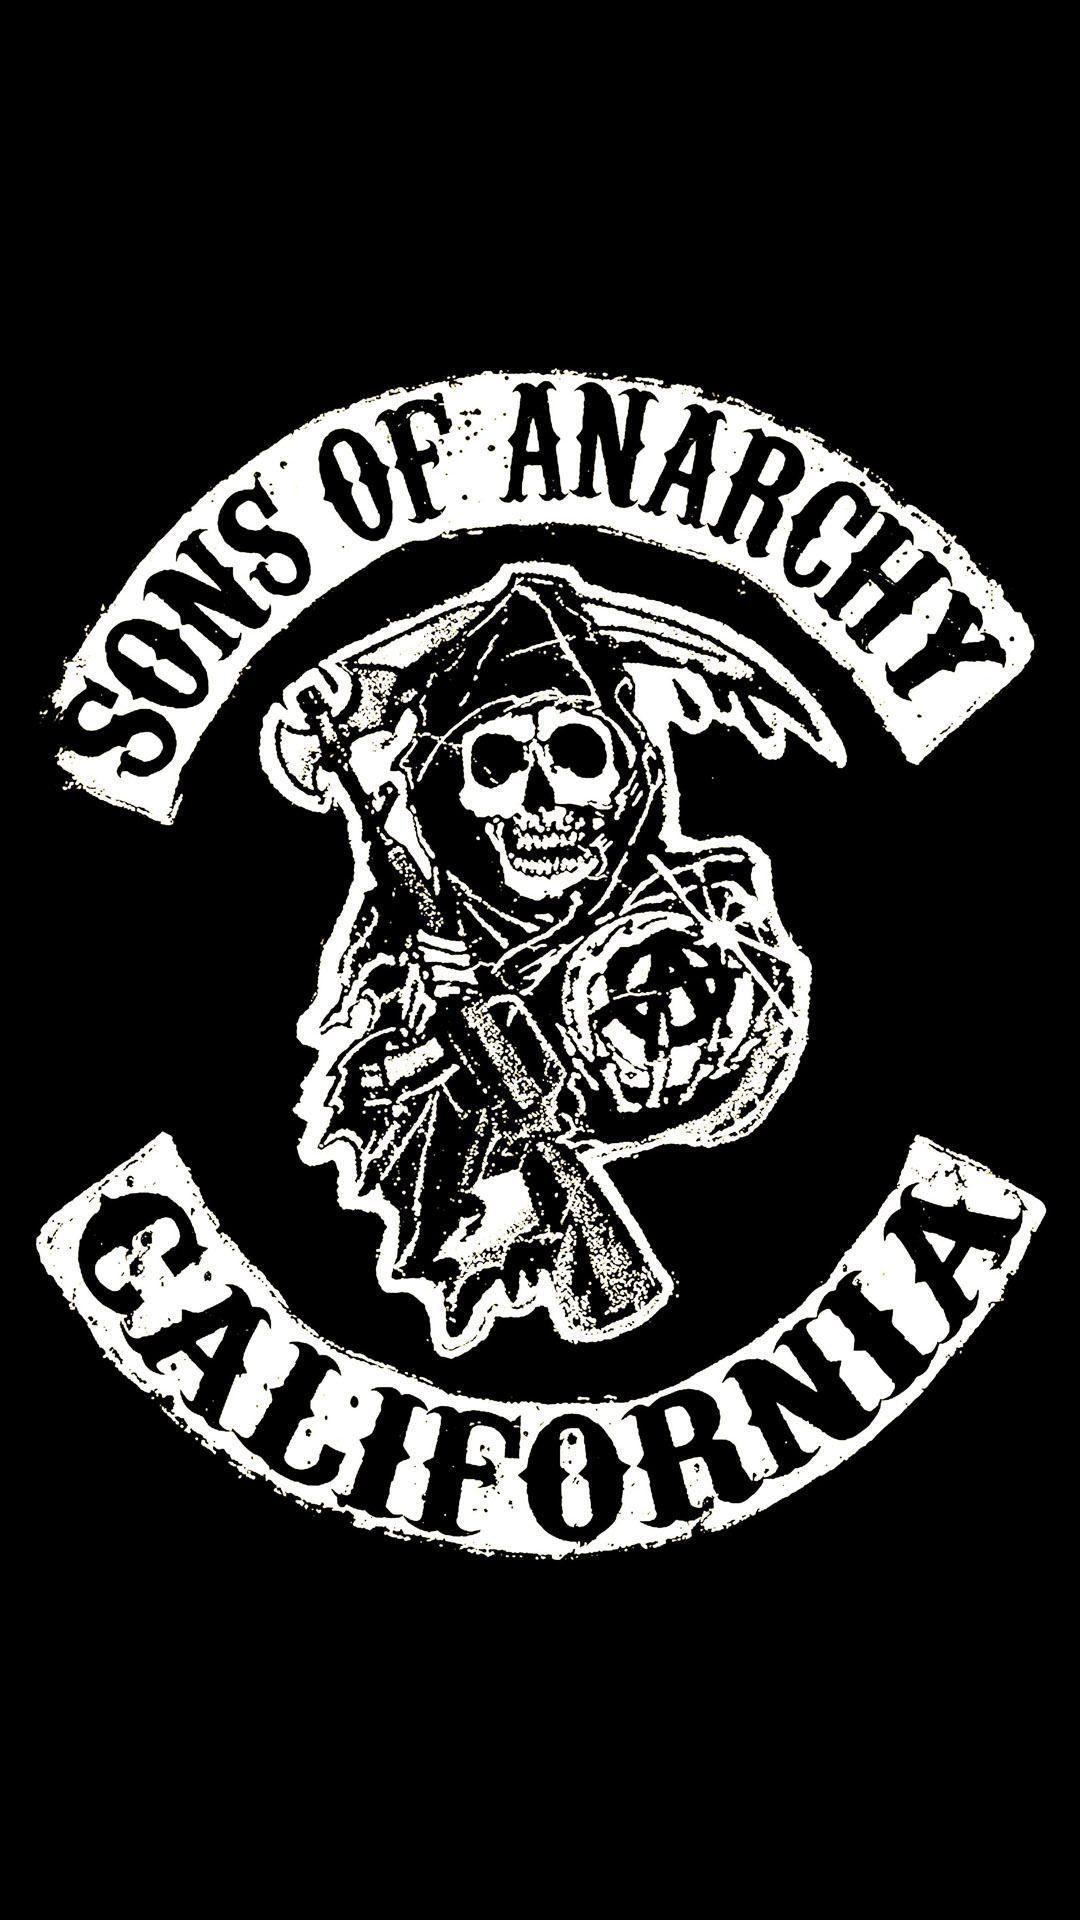 Sons Of Anarchy Wallpaper : anarchy, wallpaper, Anarchy, Phone, Wallpapers, Backgrounds, WallpaperAccess